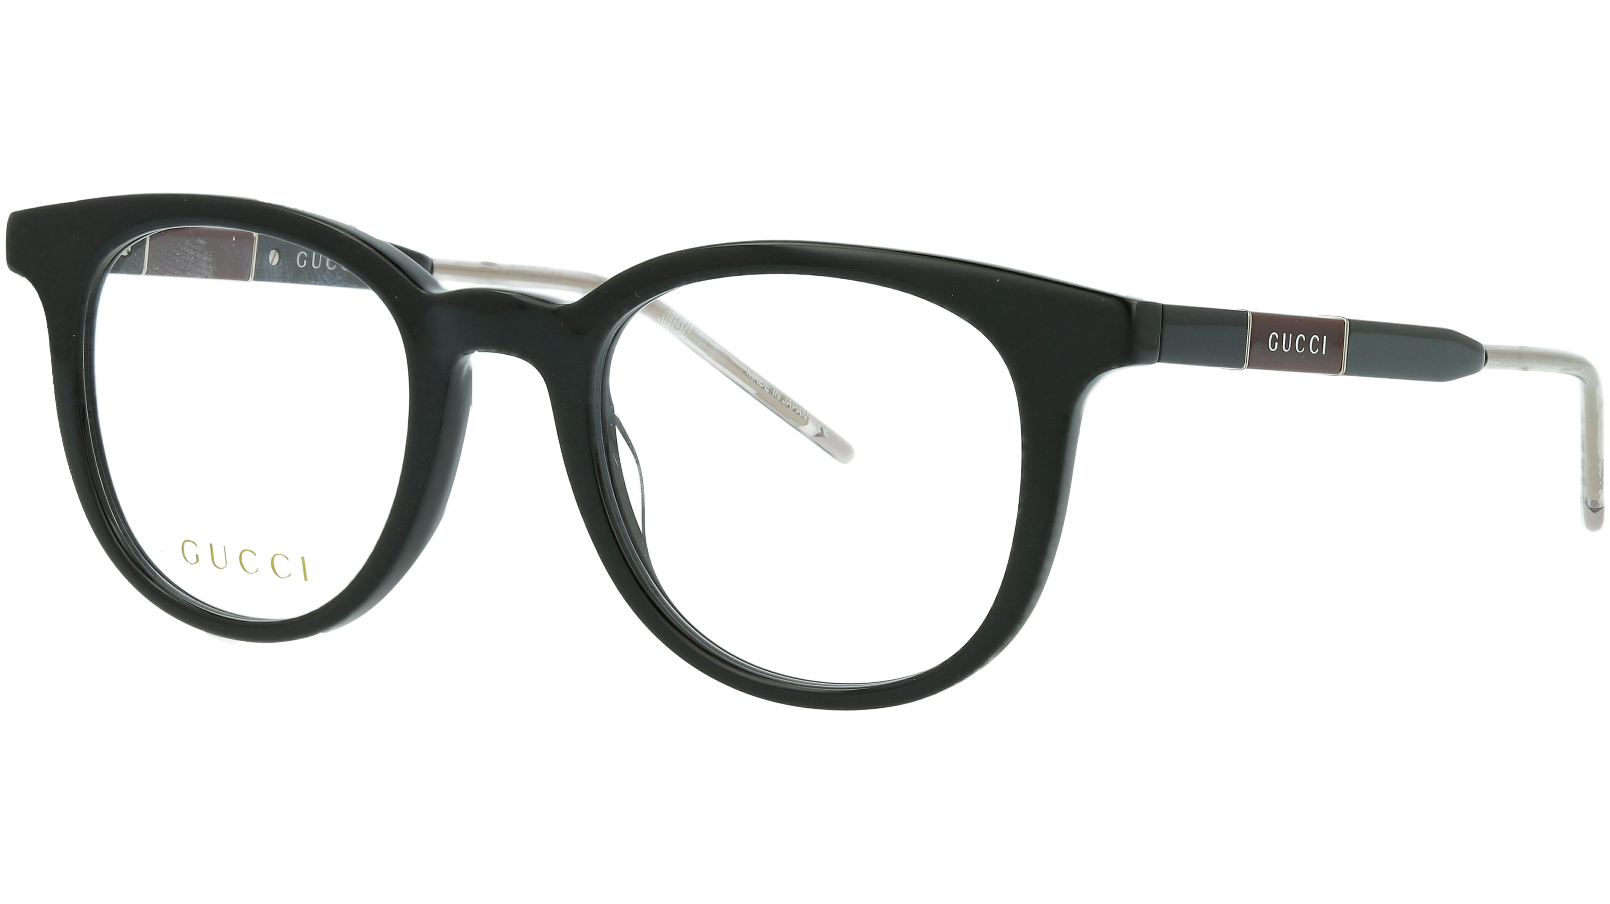 Gucci GG0845O 004 49 Black Round Eyeglasses